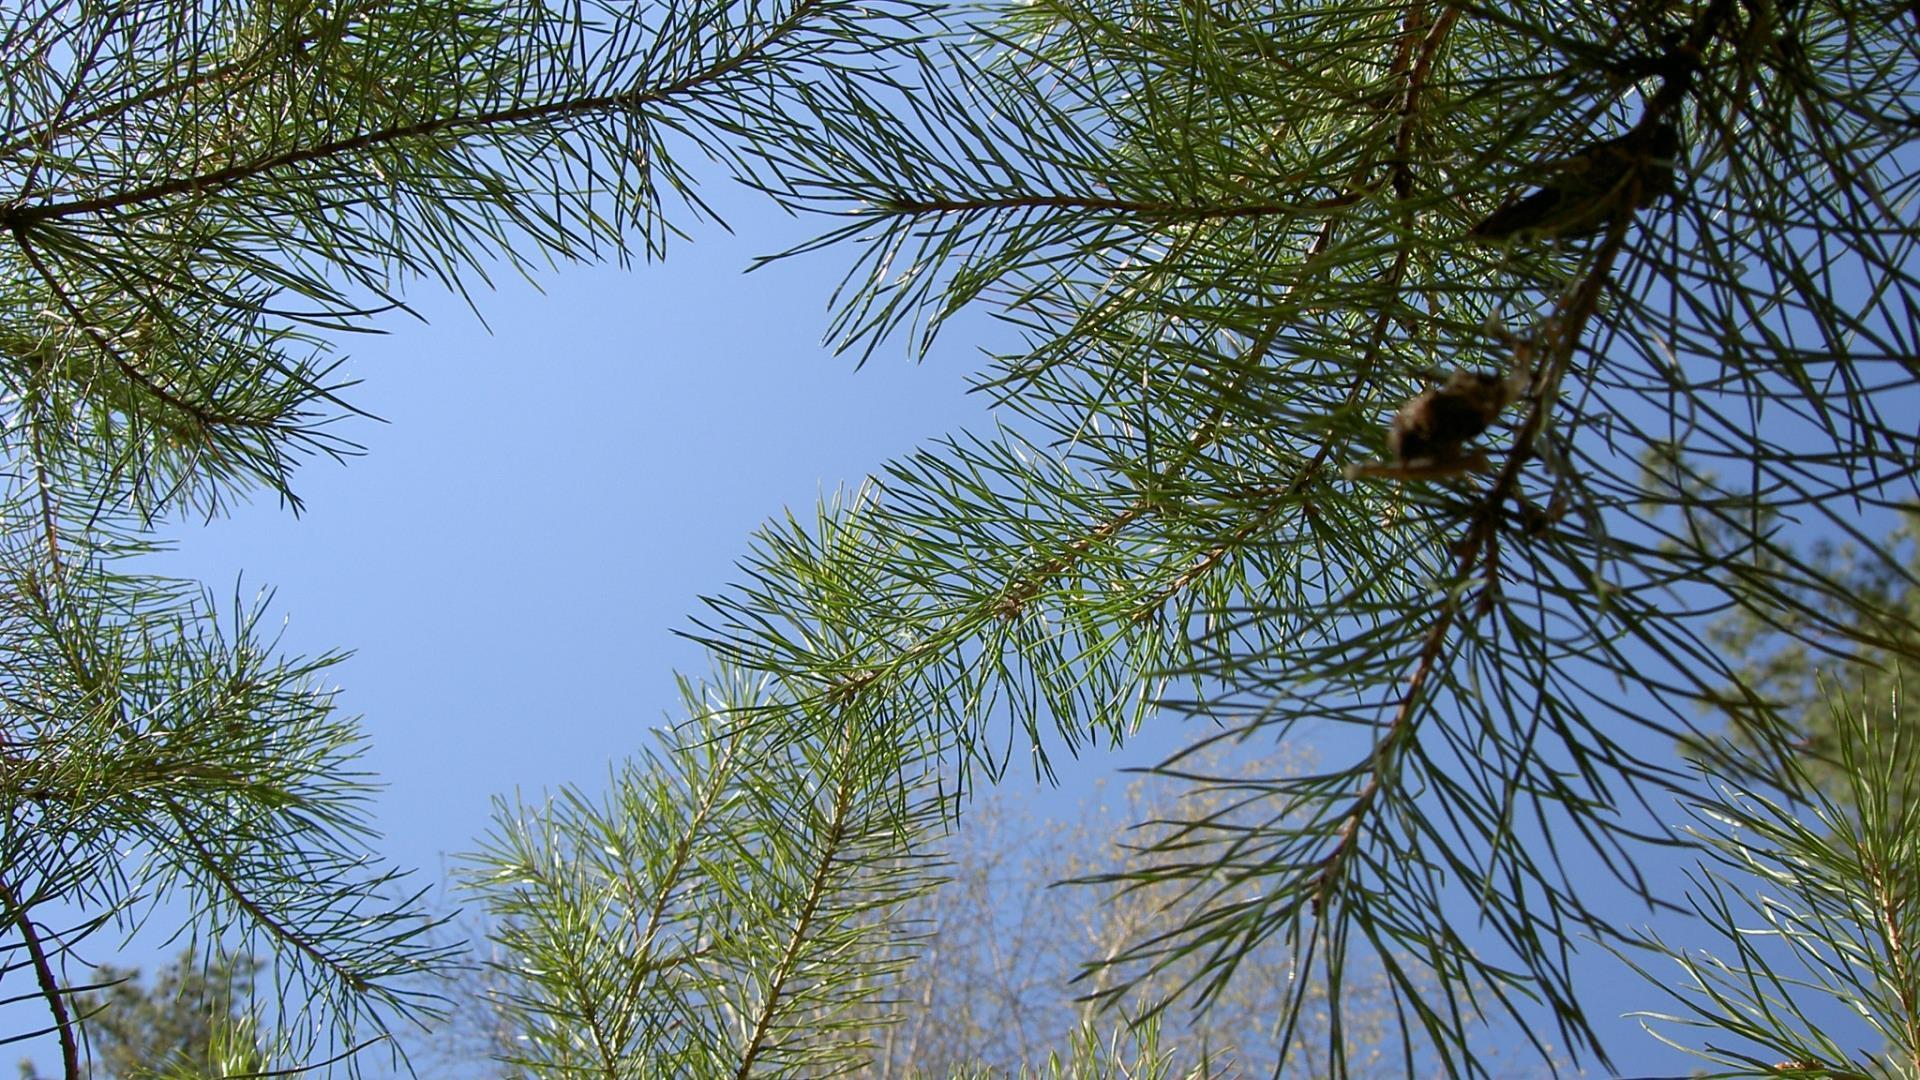 cime-des-arbres